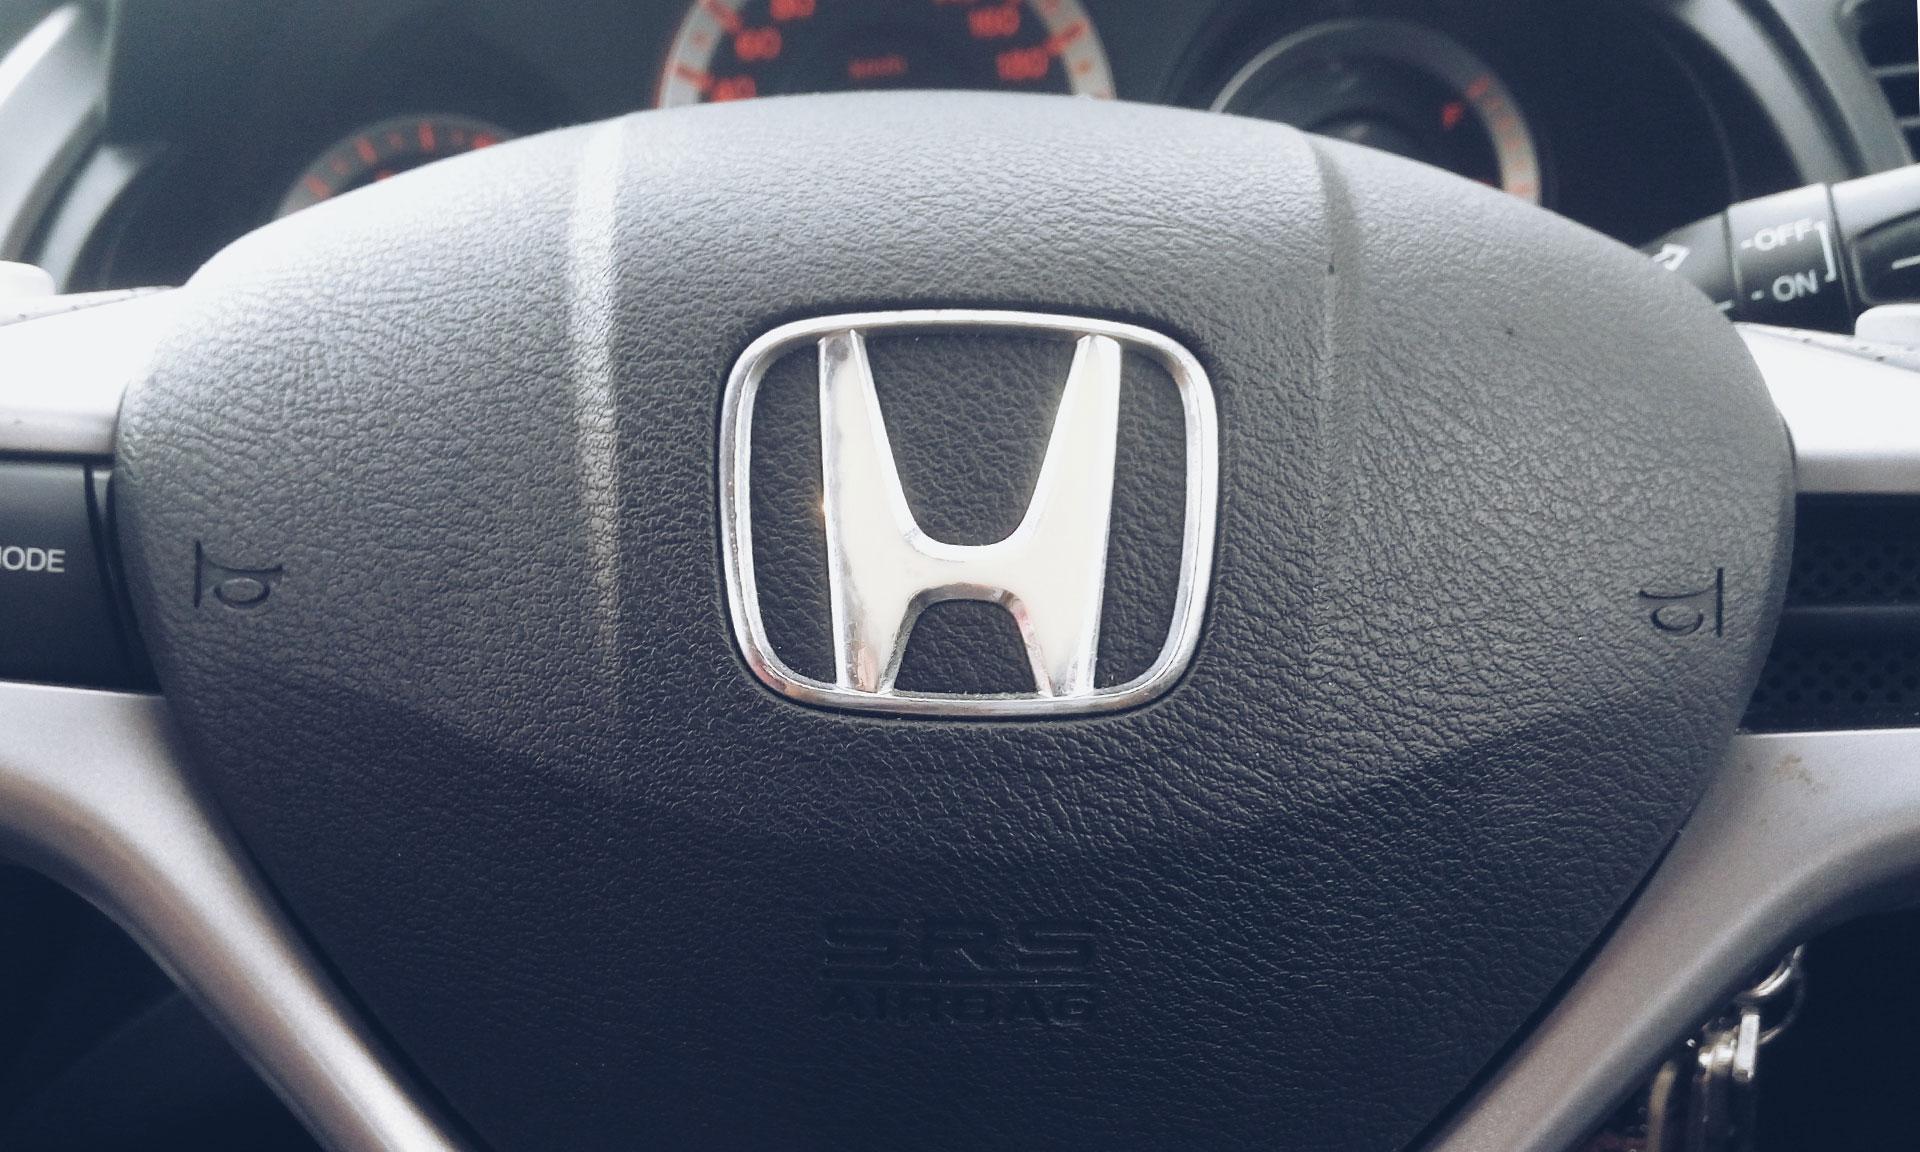 Honda Civic Ecu Problems